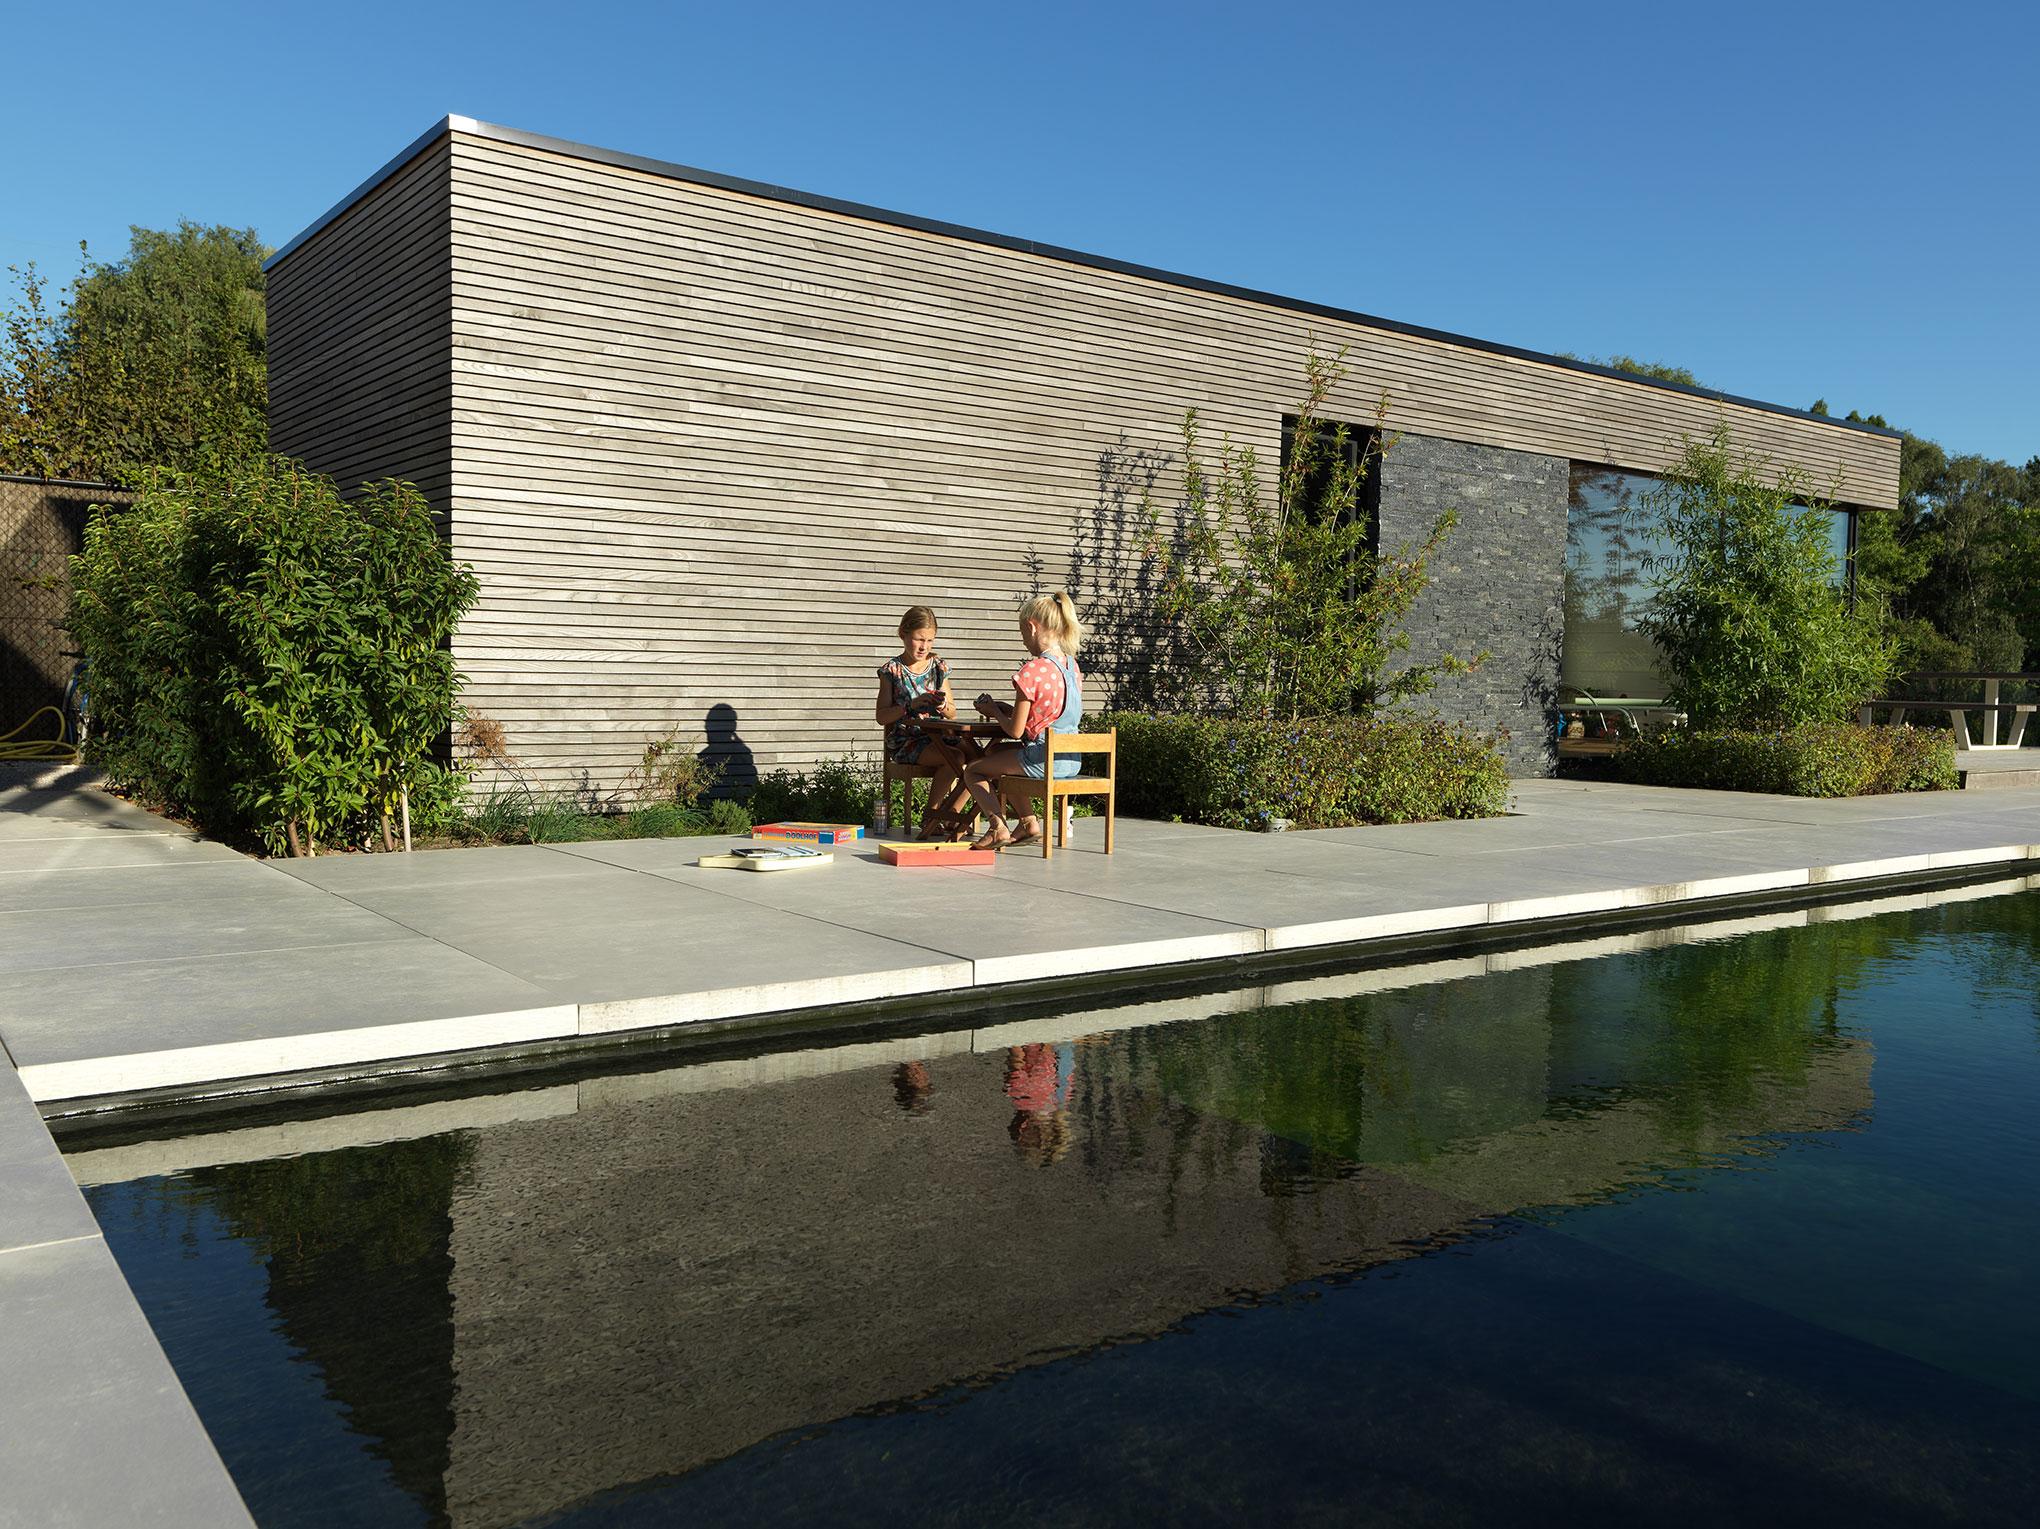 Multifunktionales Modernes Poolhaus Mit Gartenhaus In Waregem